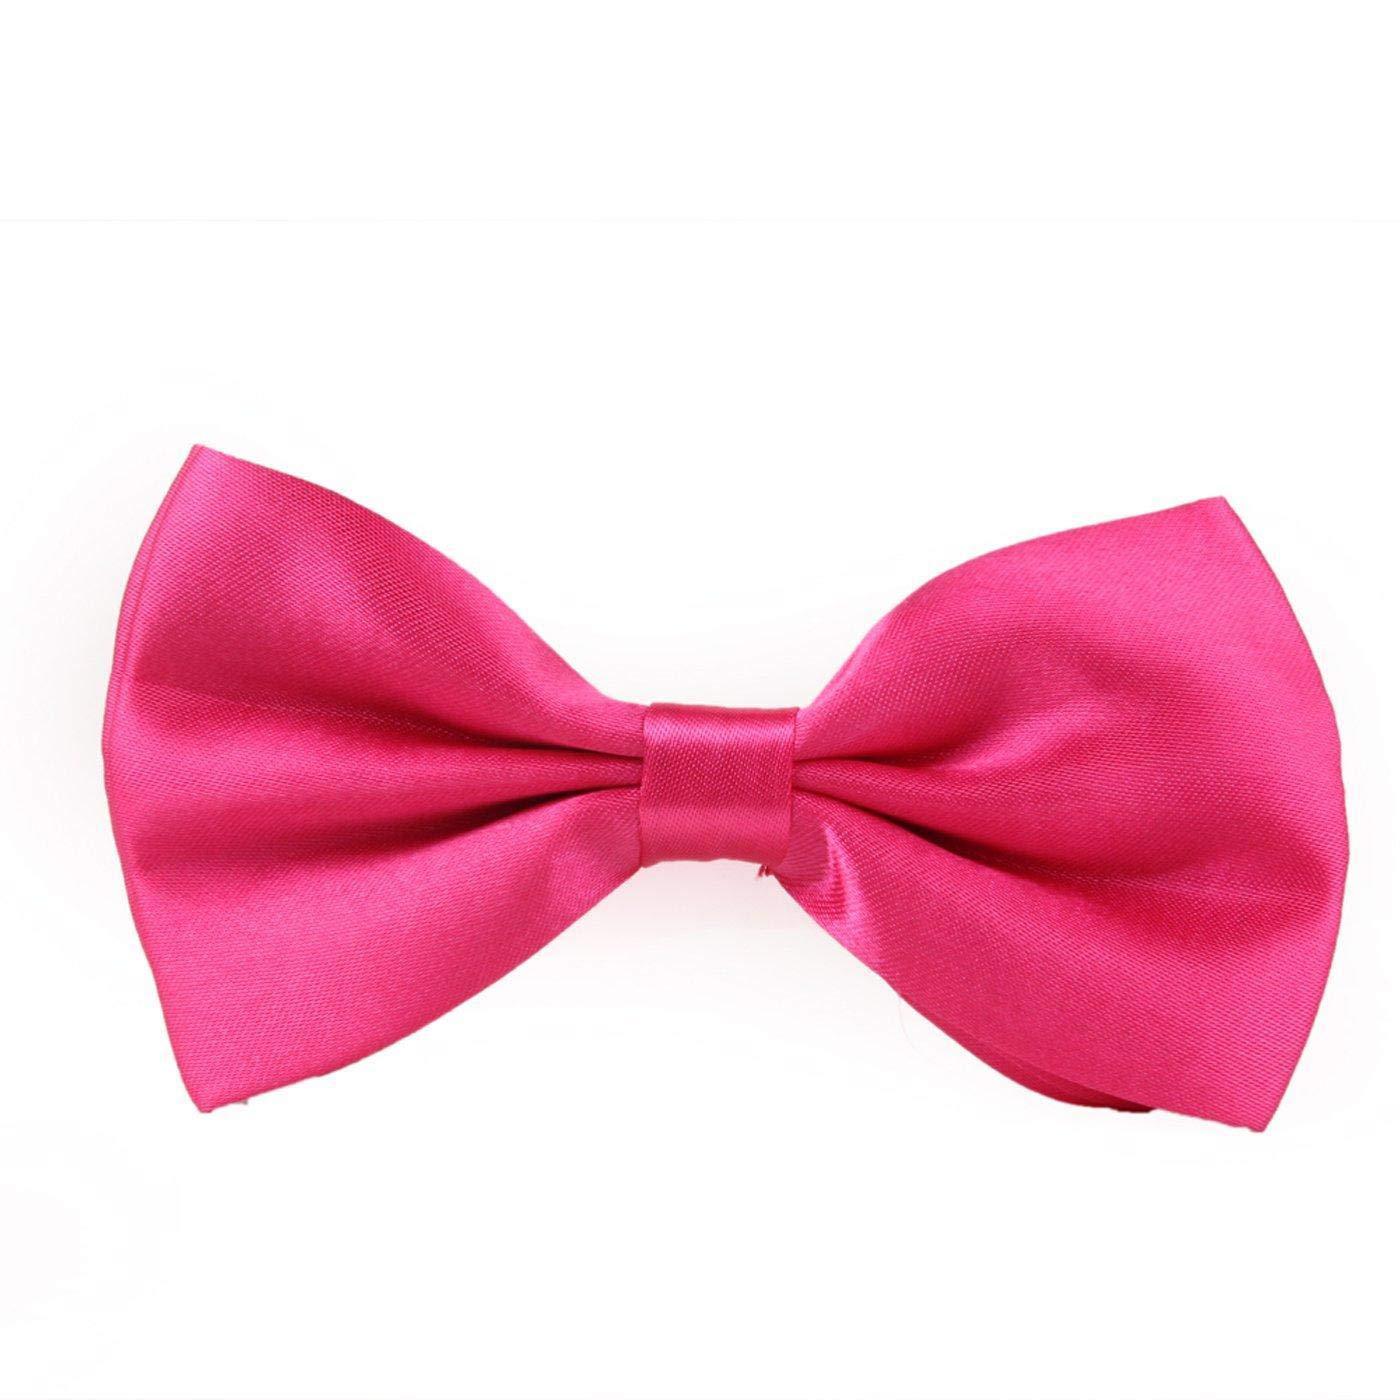 Huojingli Bow Ties for Men Solid Clip Bow Tie for Formal Tuxedo Wedding